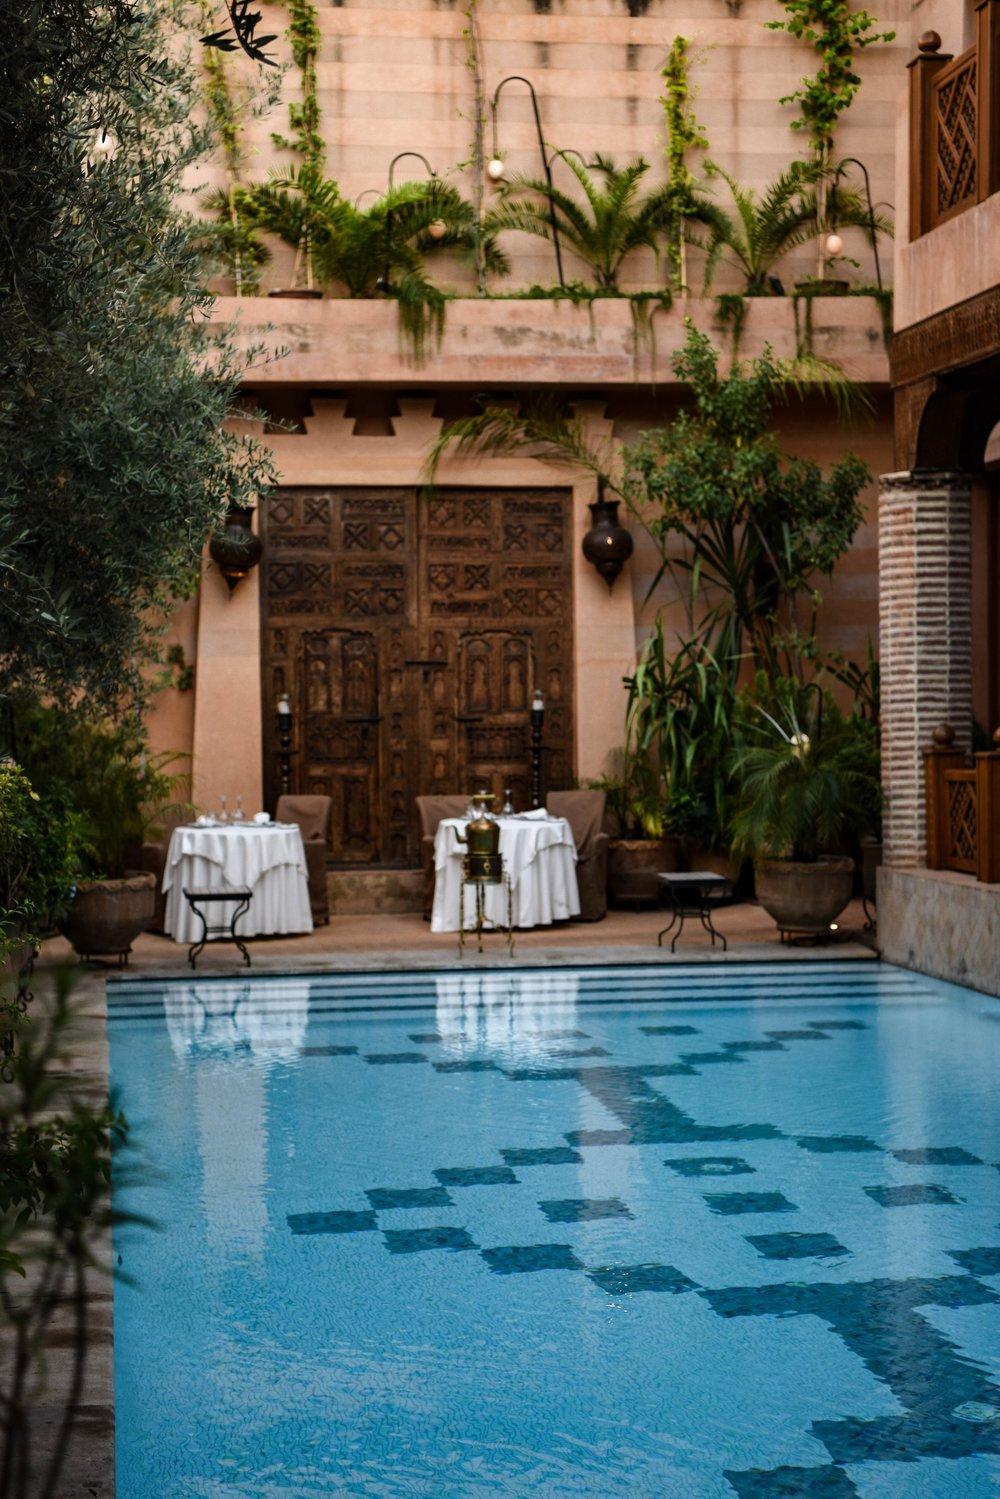 La_Maison_Arabe_in_the_Medina_Weston_Table.jpg